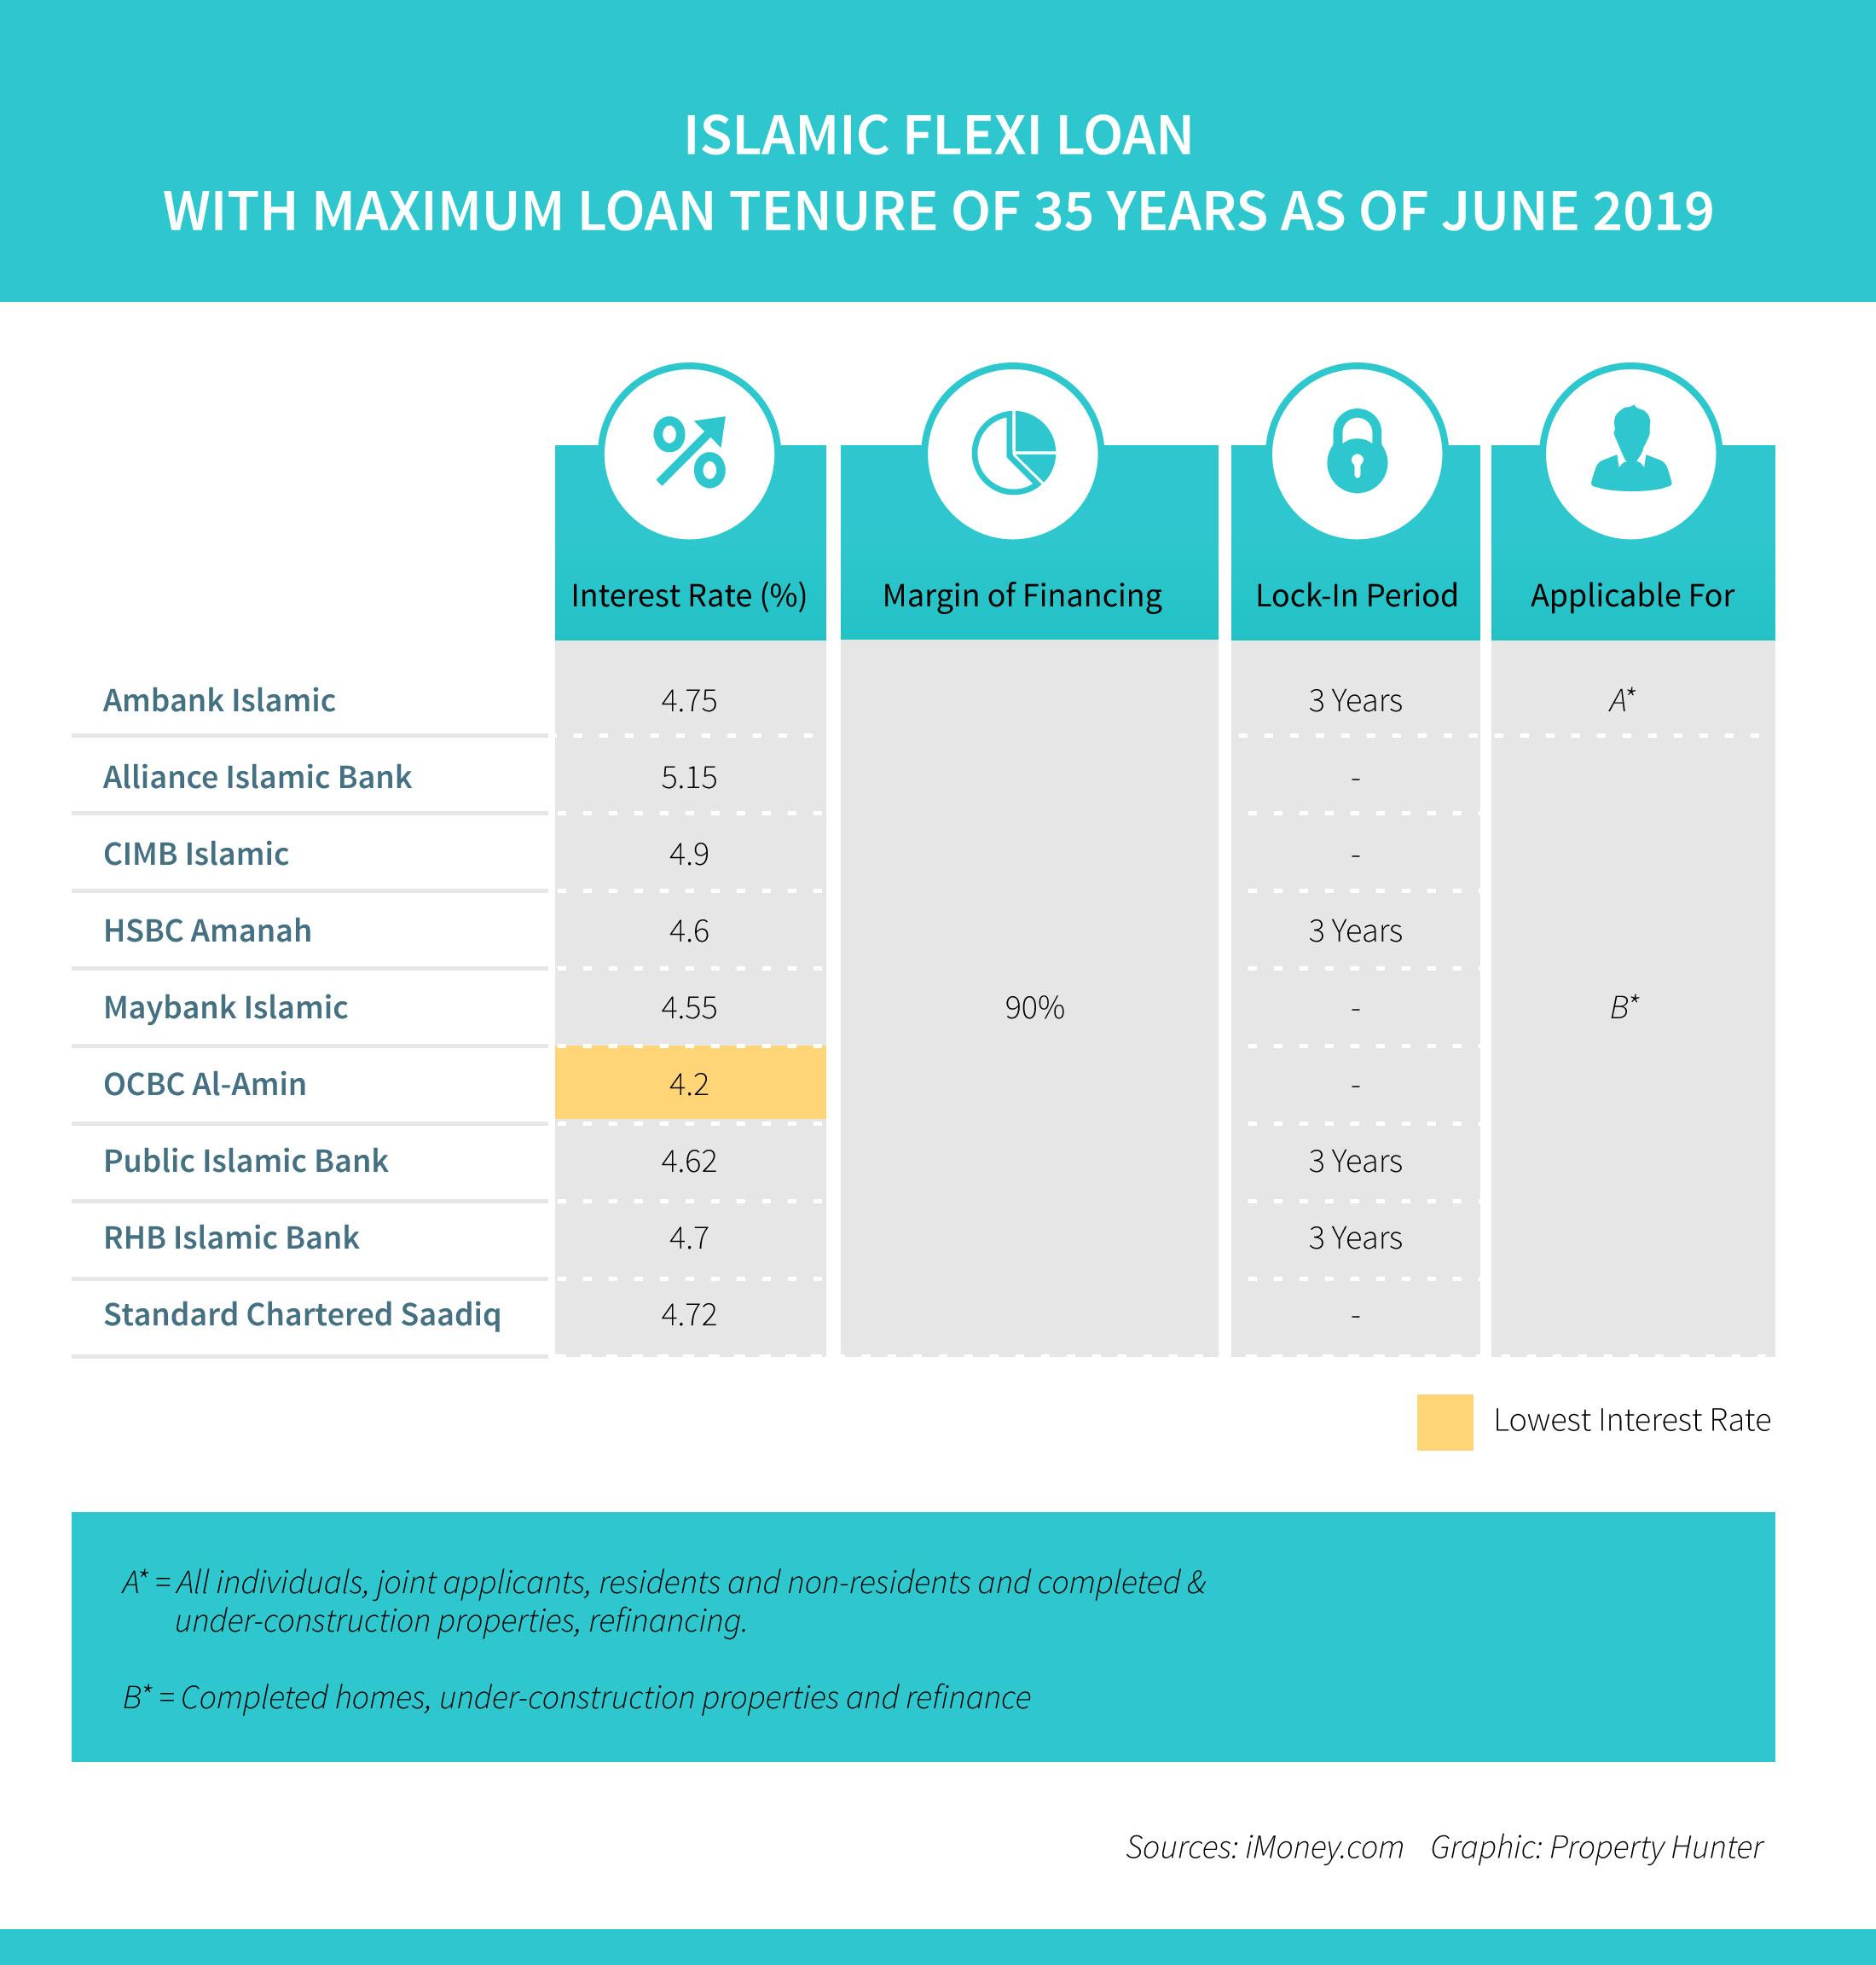 Islamic Flexi Loans interest rates as of June 2019